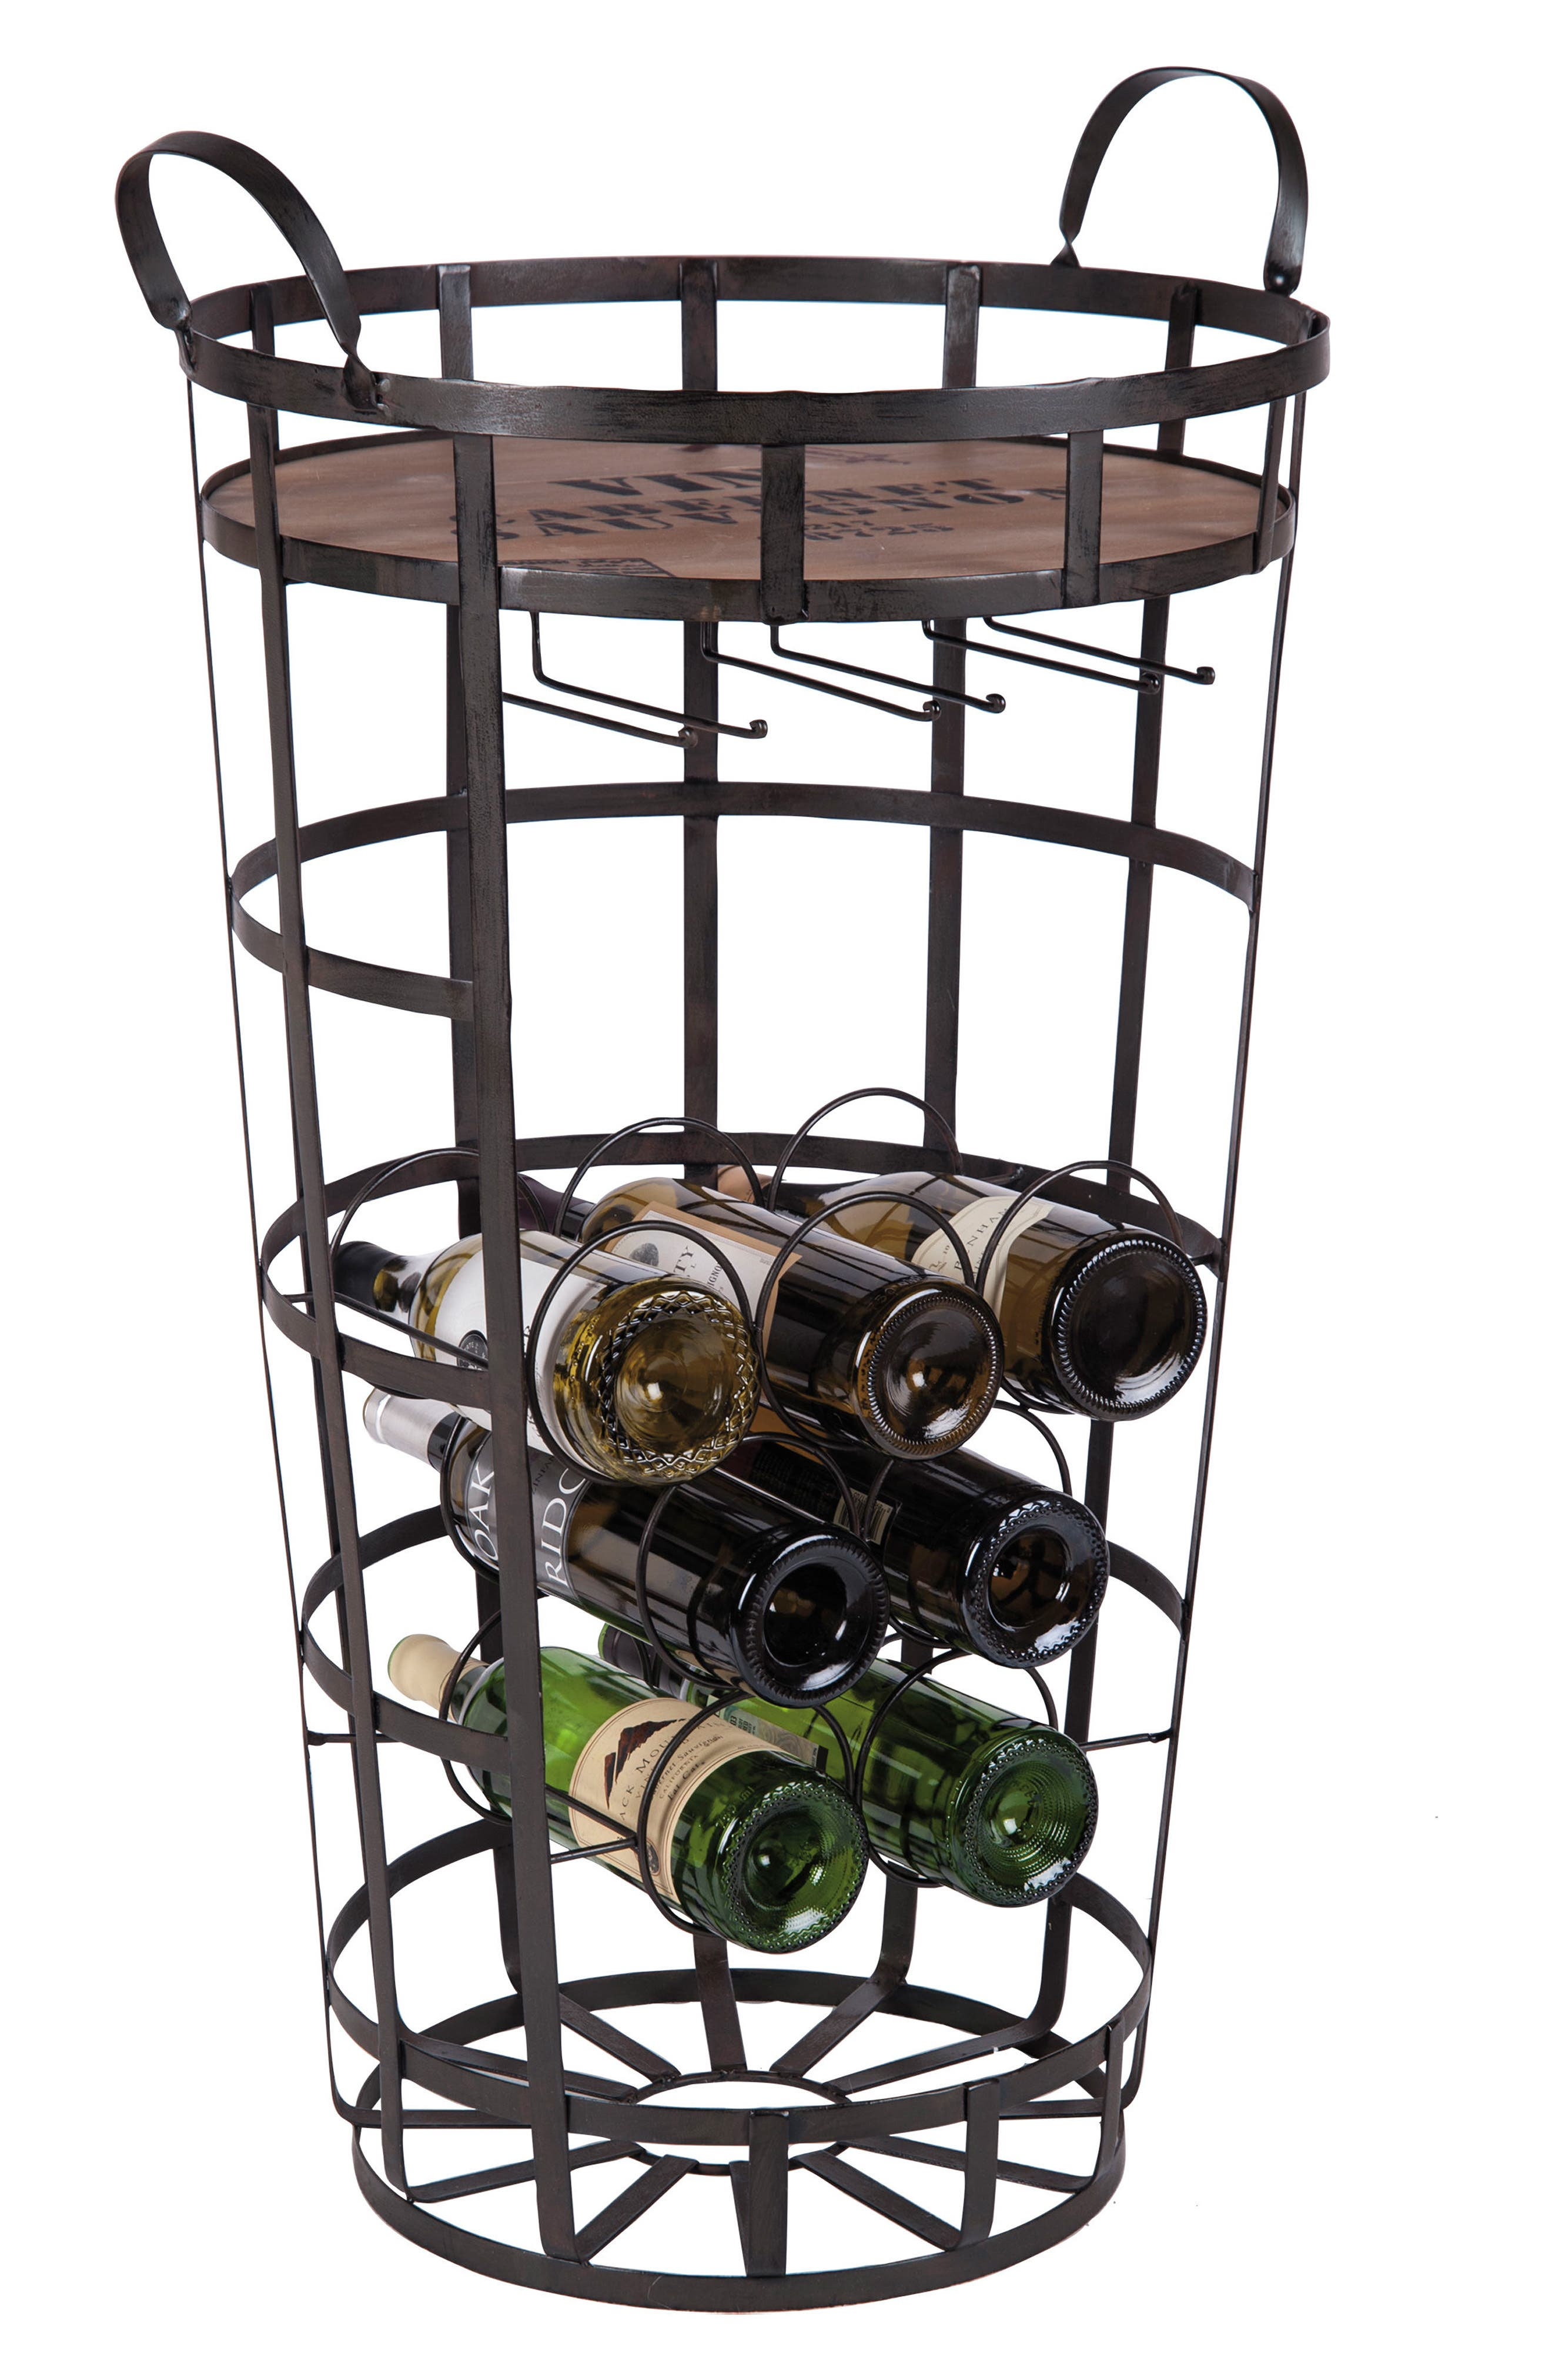 Main Image - Foreside Bar Cart & Wine Rack